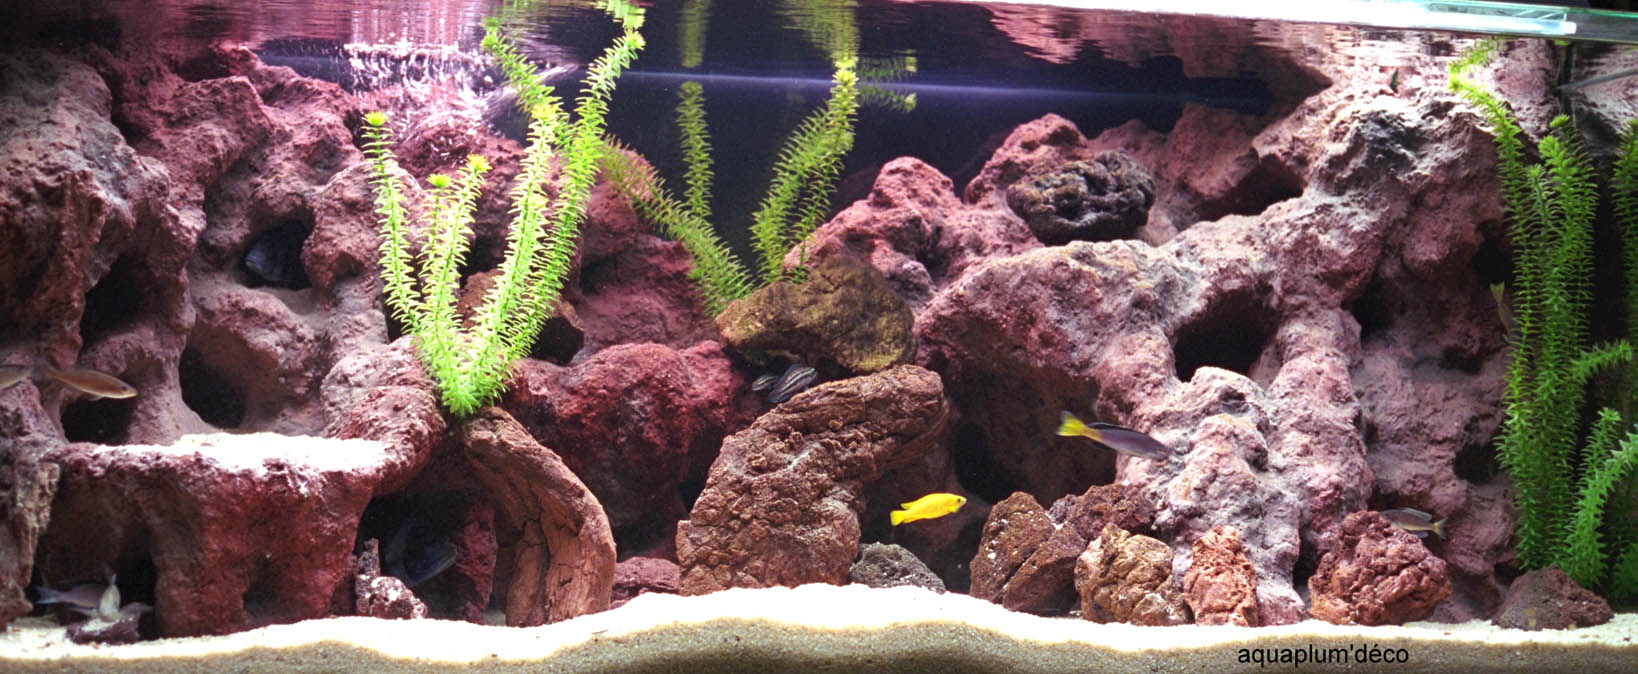 décor aquarium roche volcanique